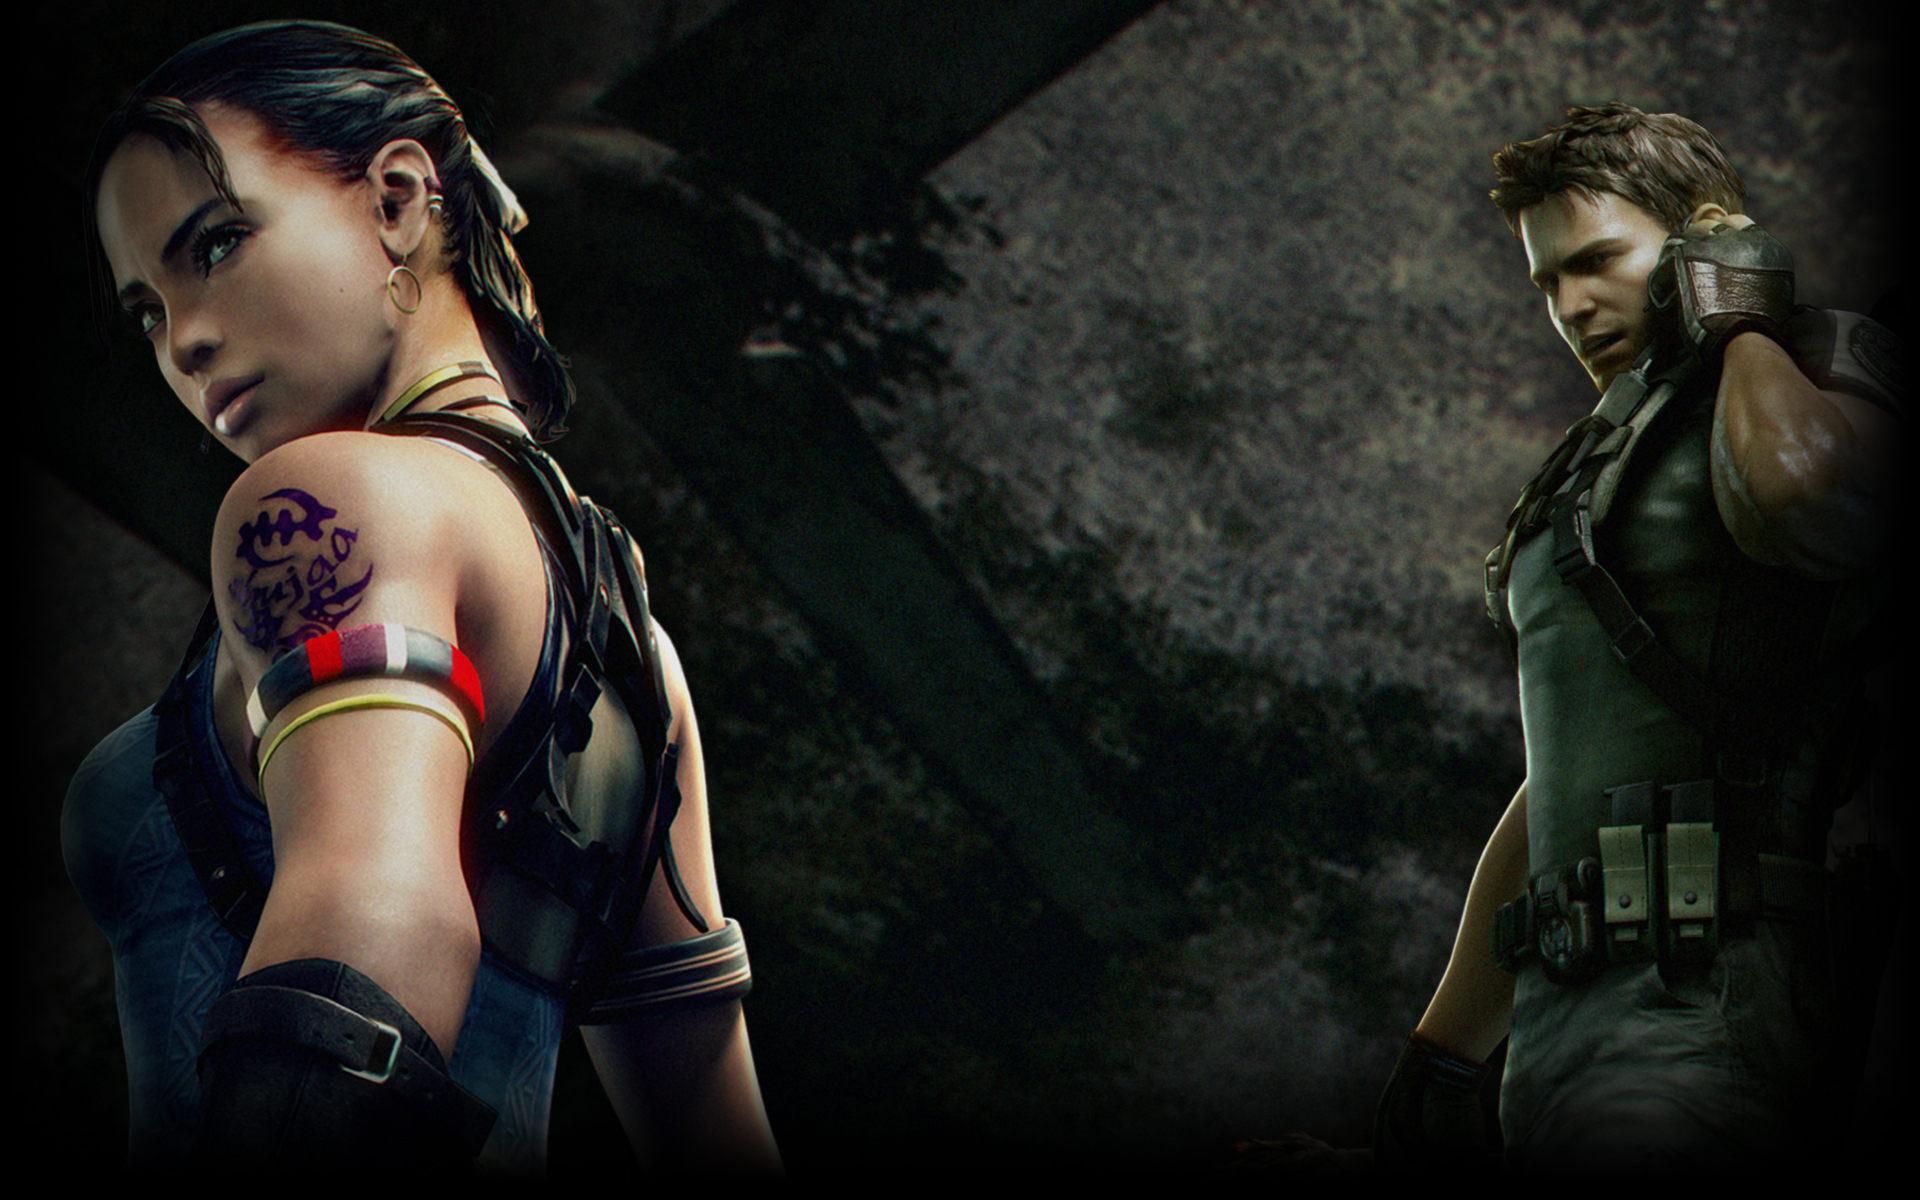 Resident Evil 5 Appid 21690 Steamdb